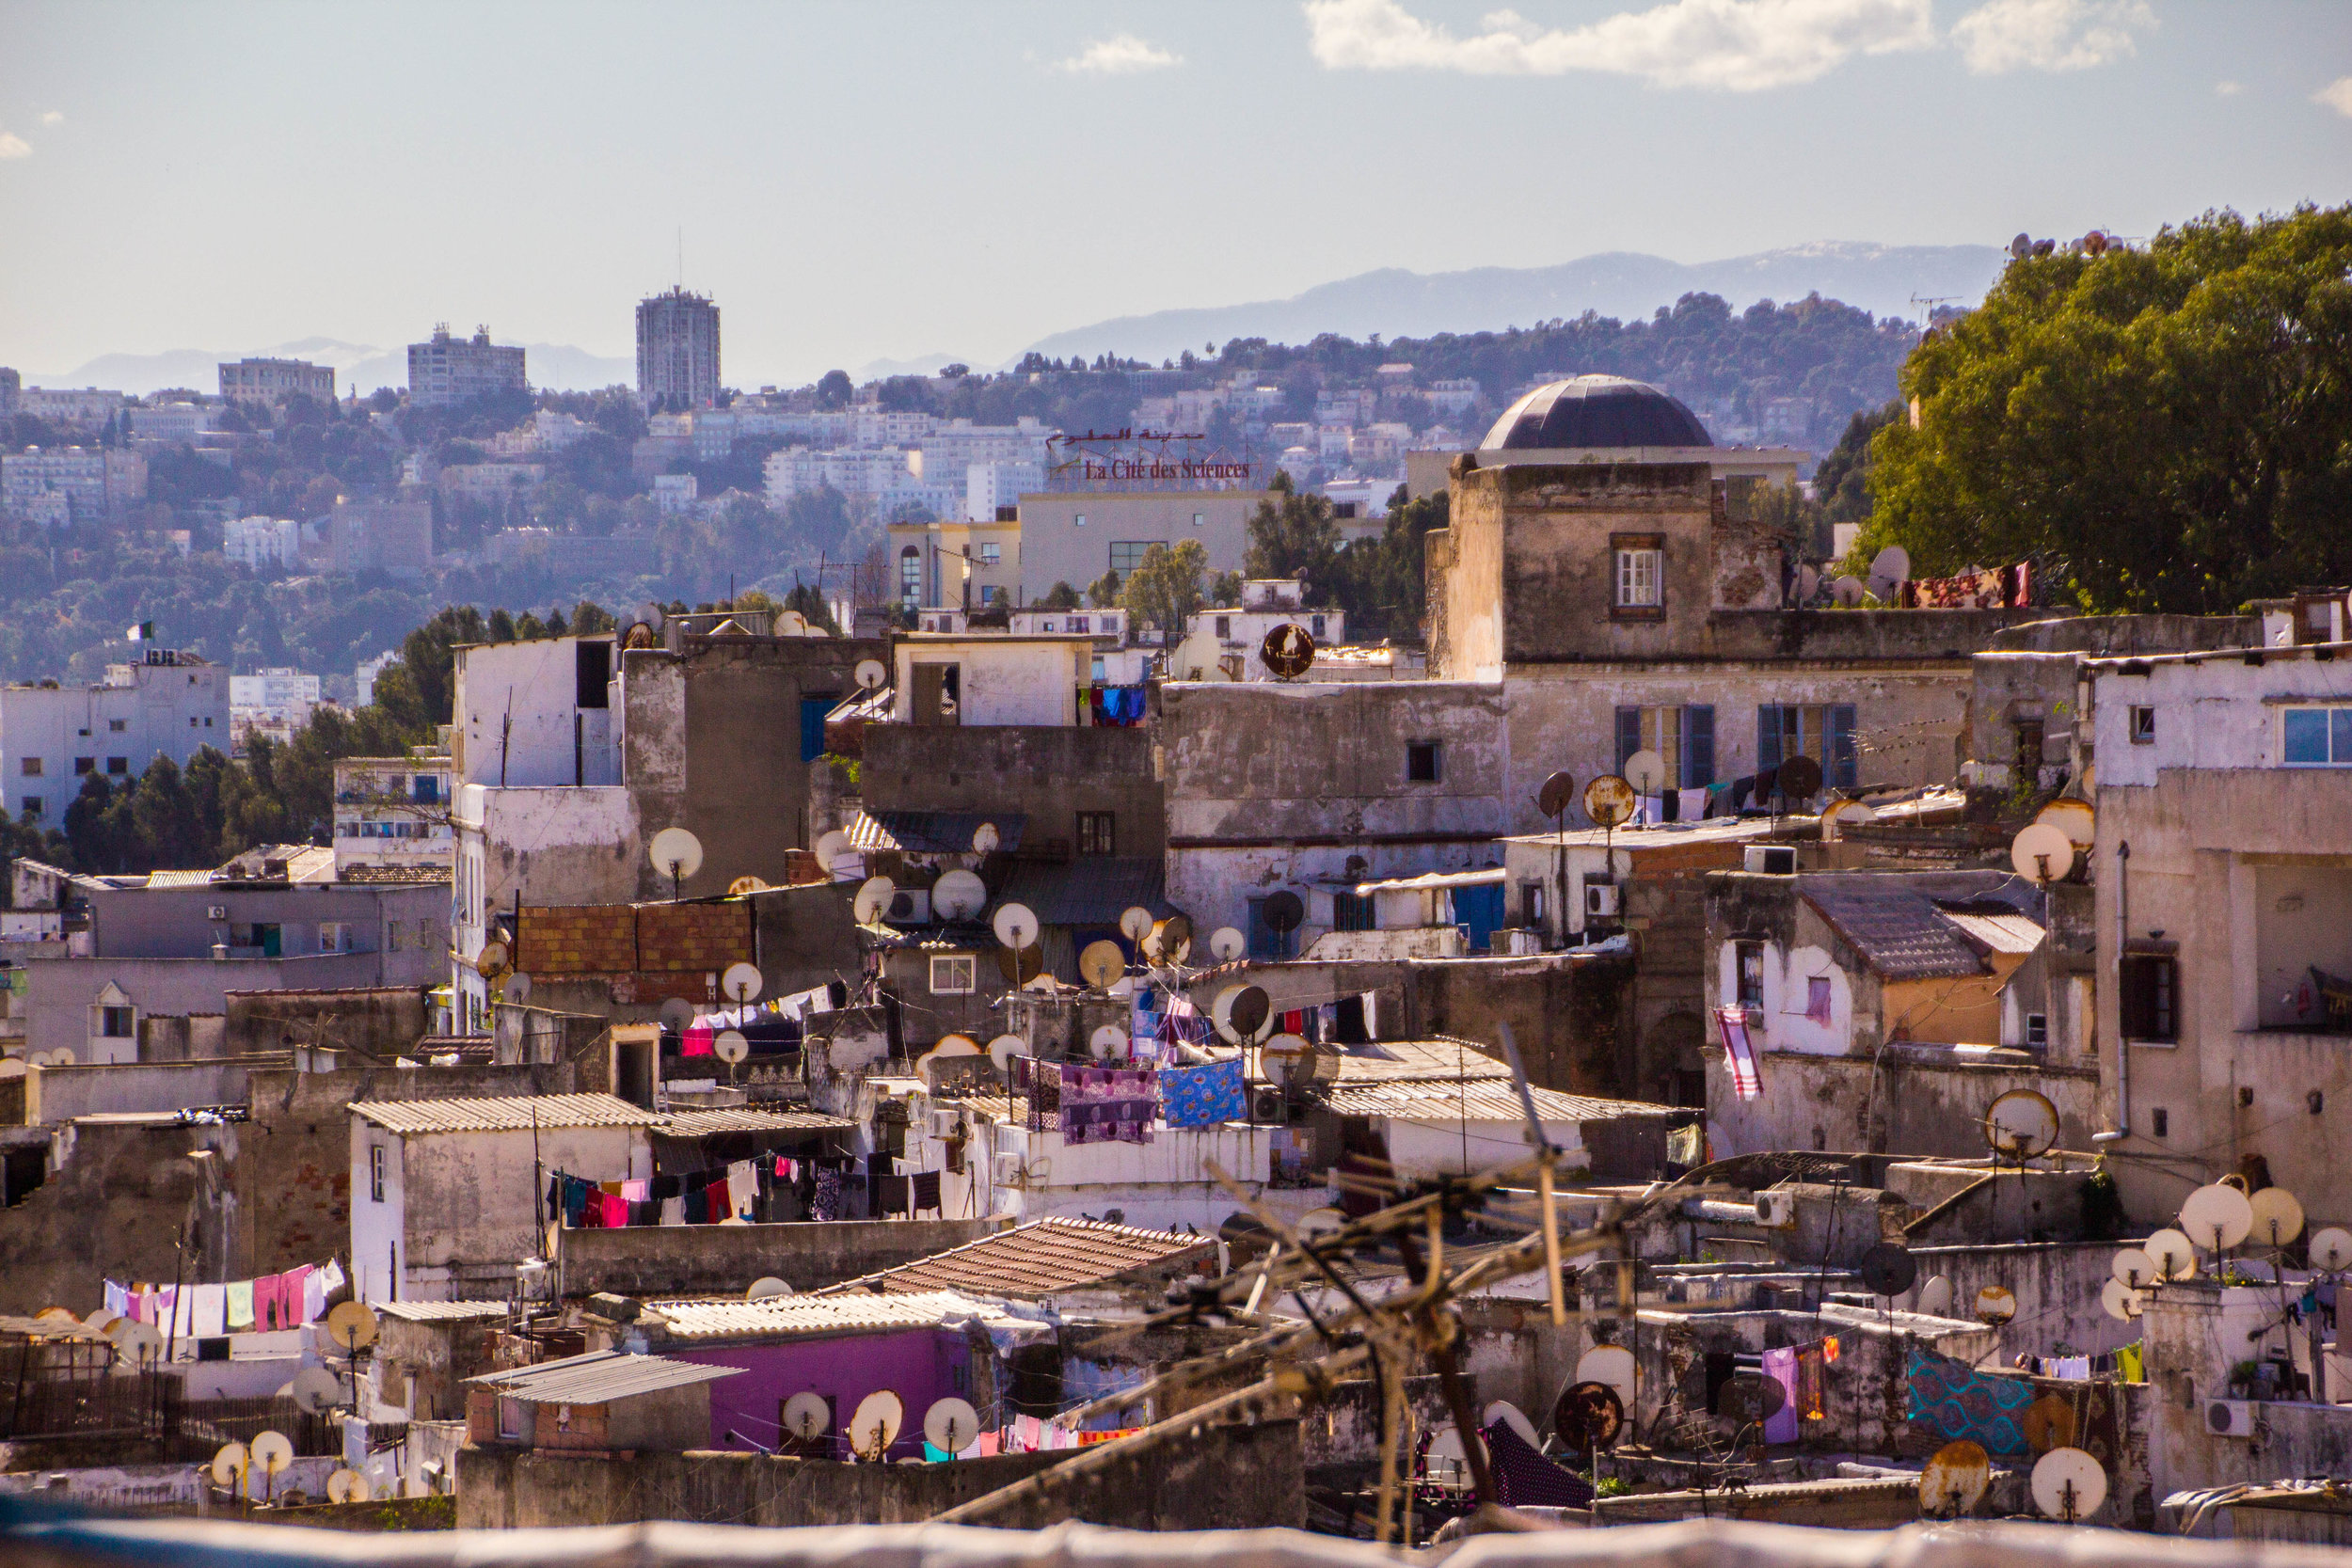 casbah-from-above-algiers-algeria-20.jpg